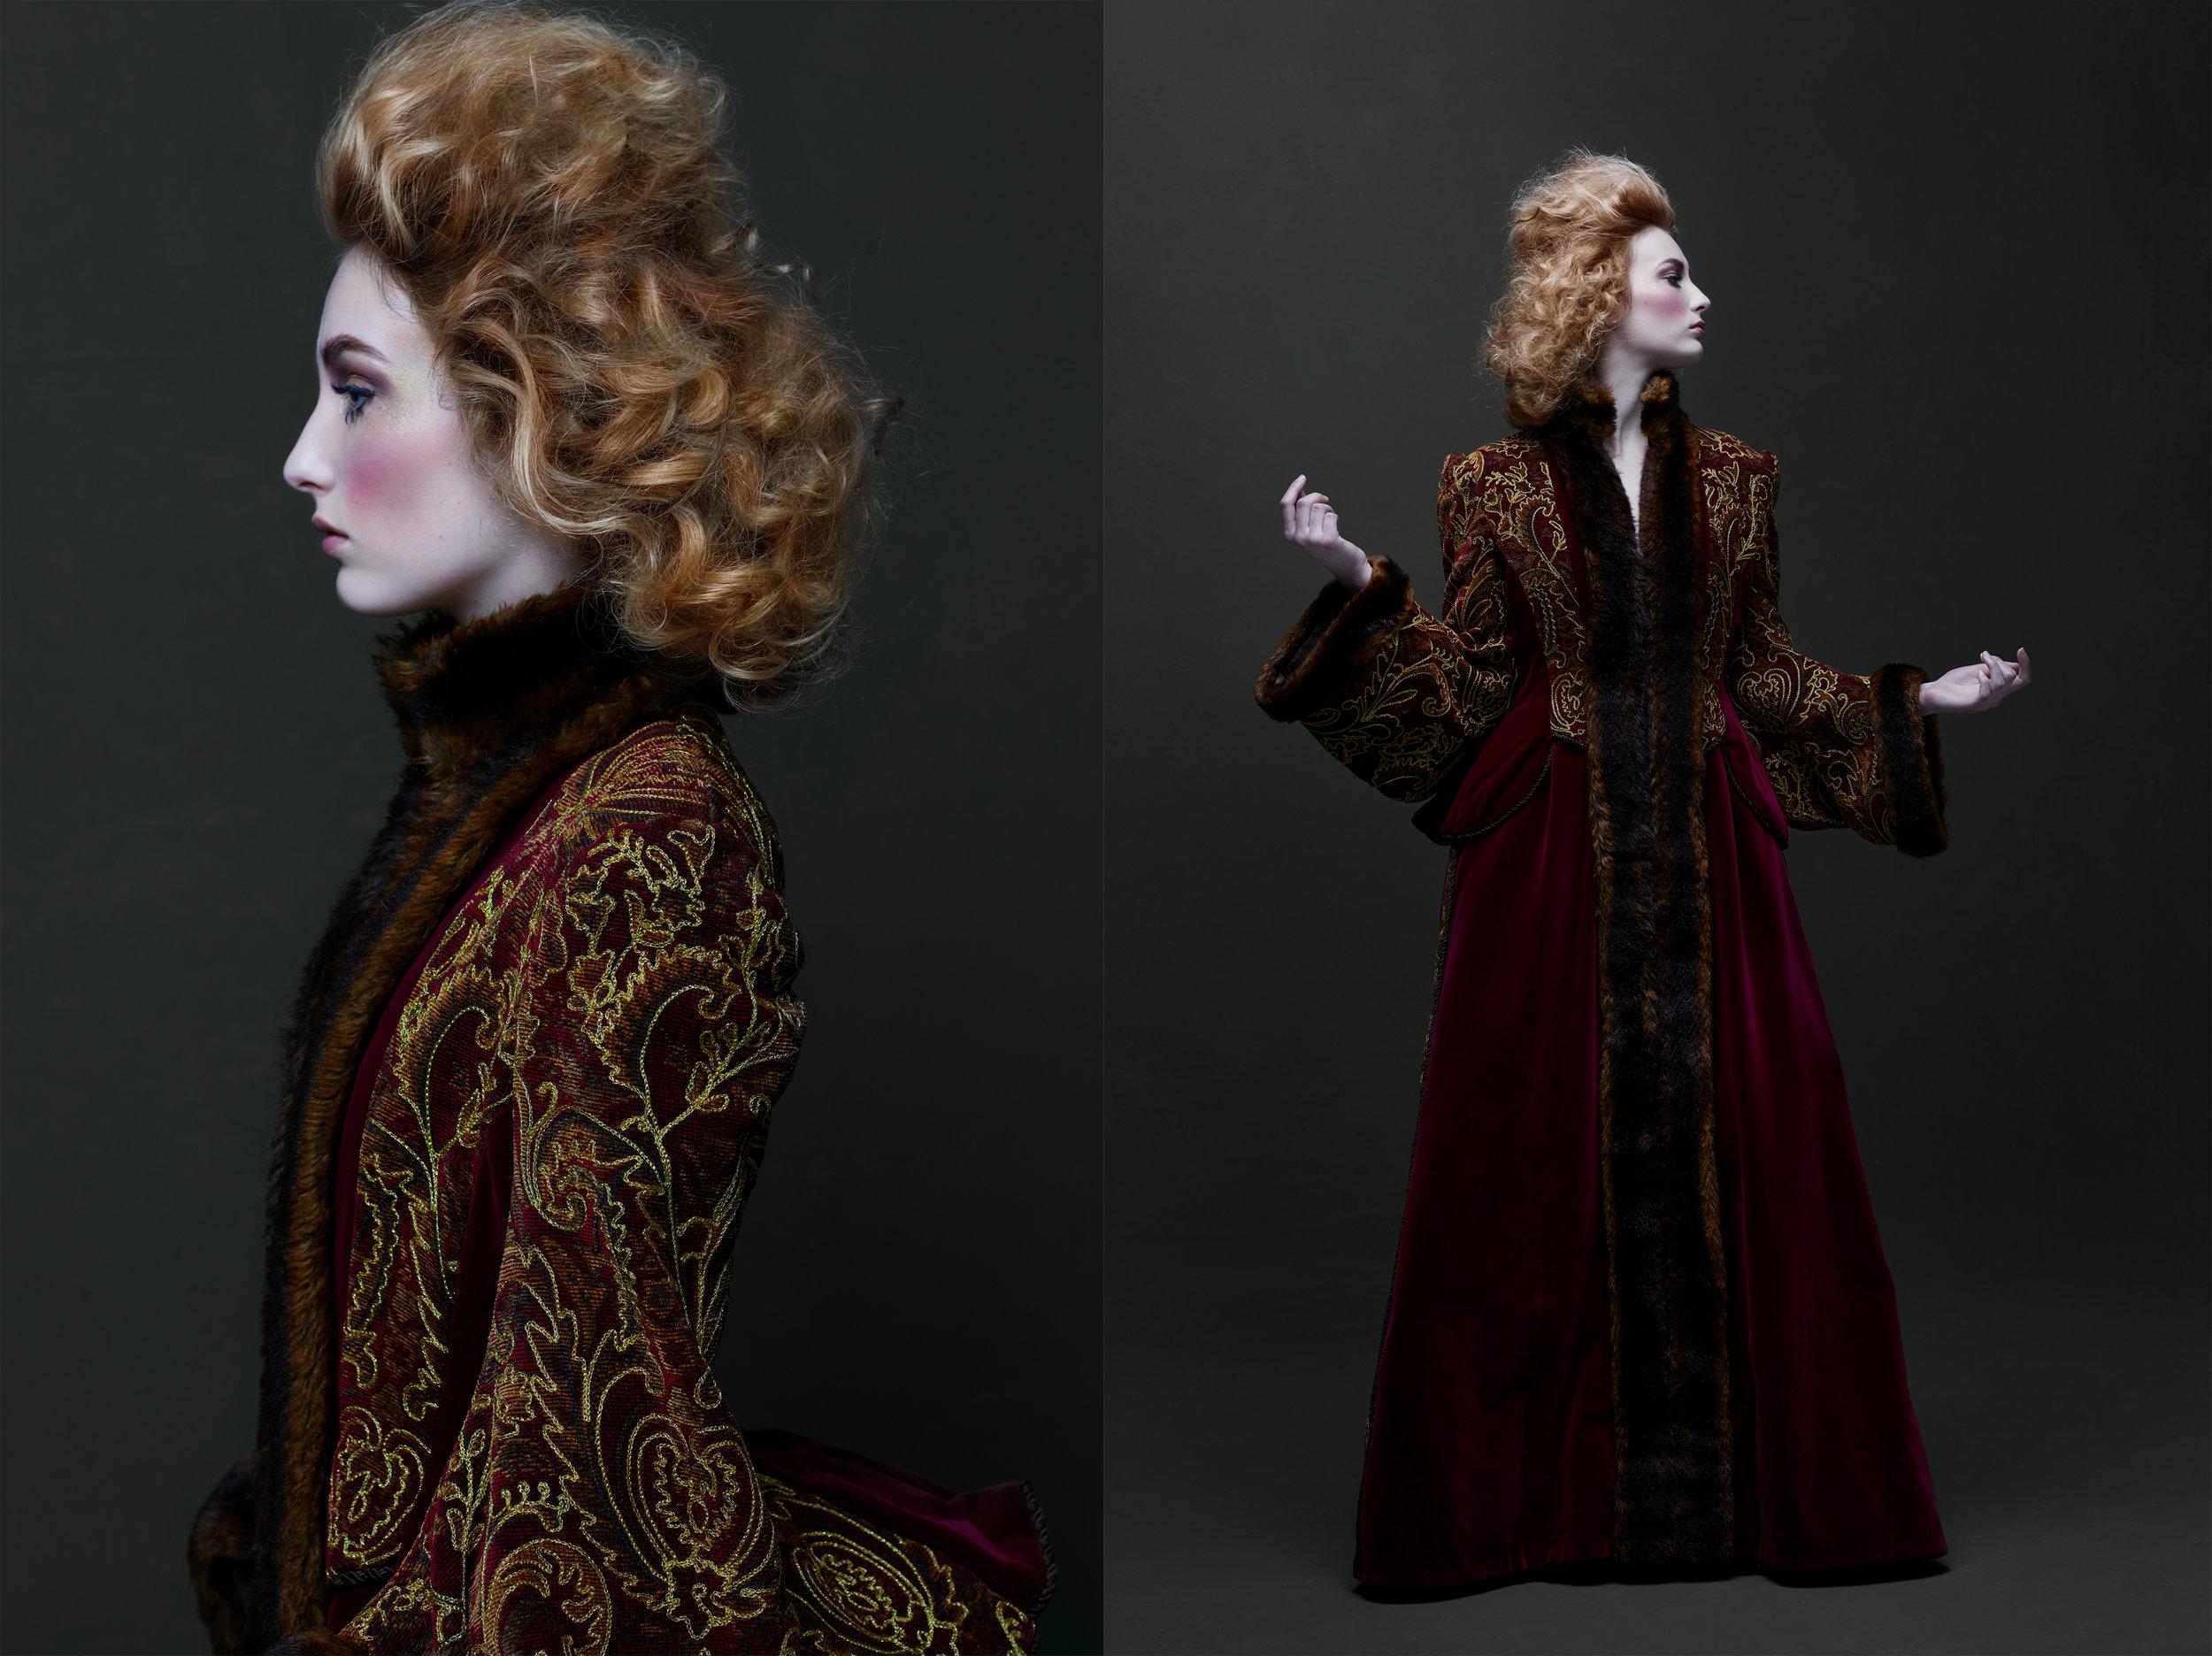 The Russian dress